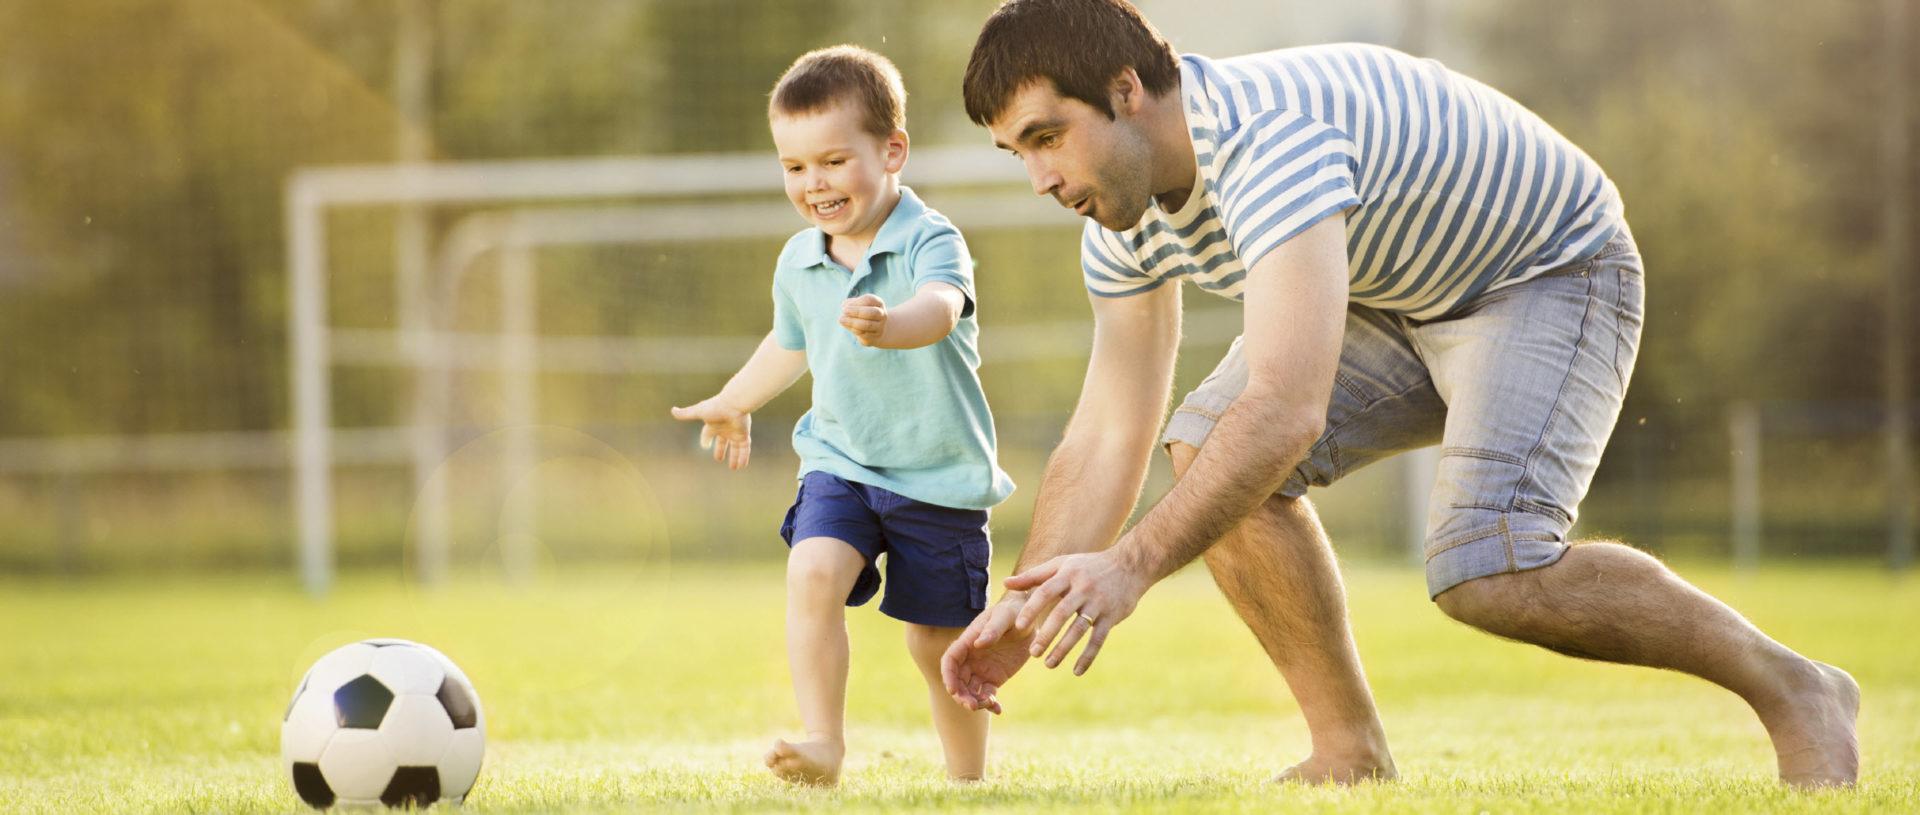 Fathers Child Custody Rights